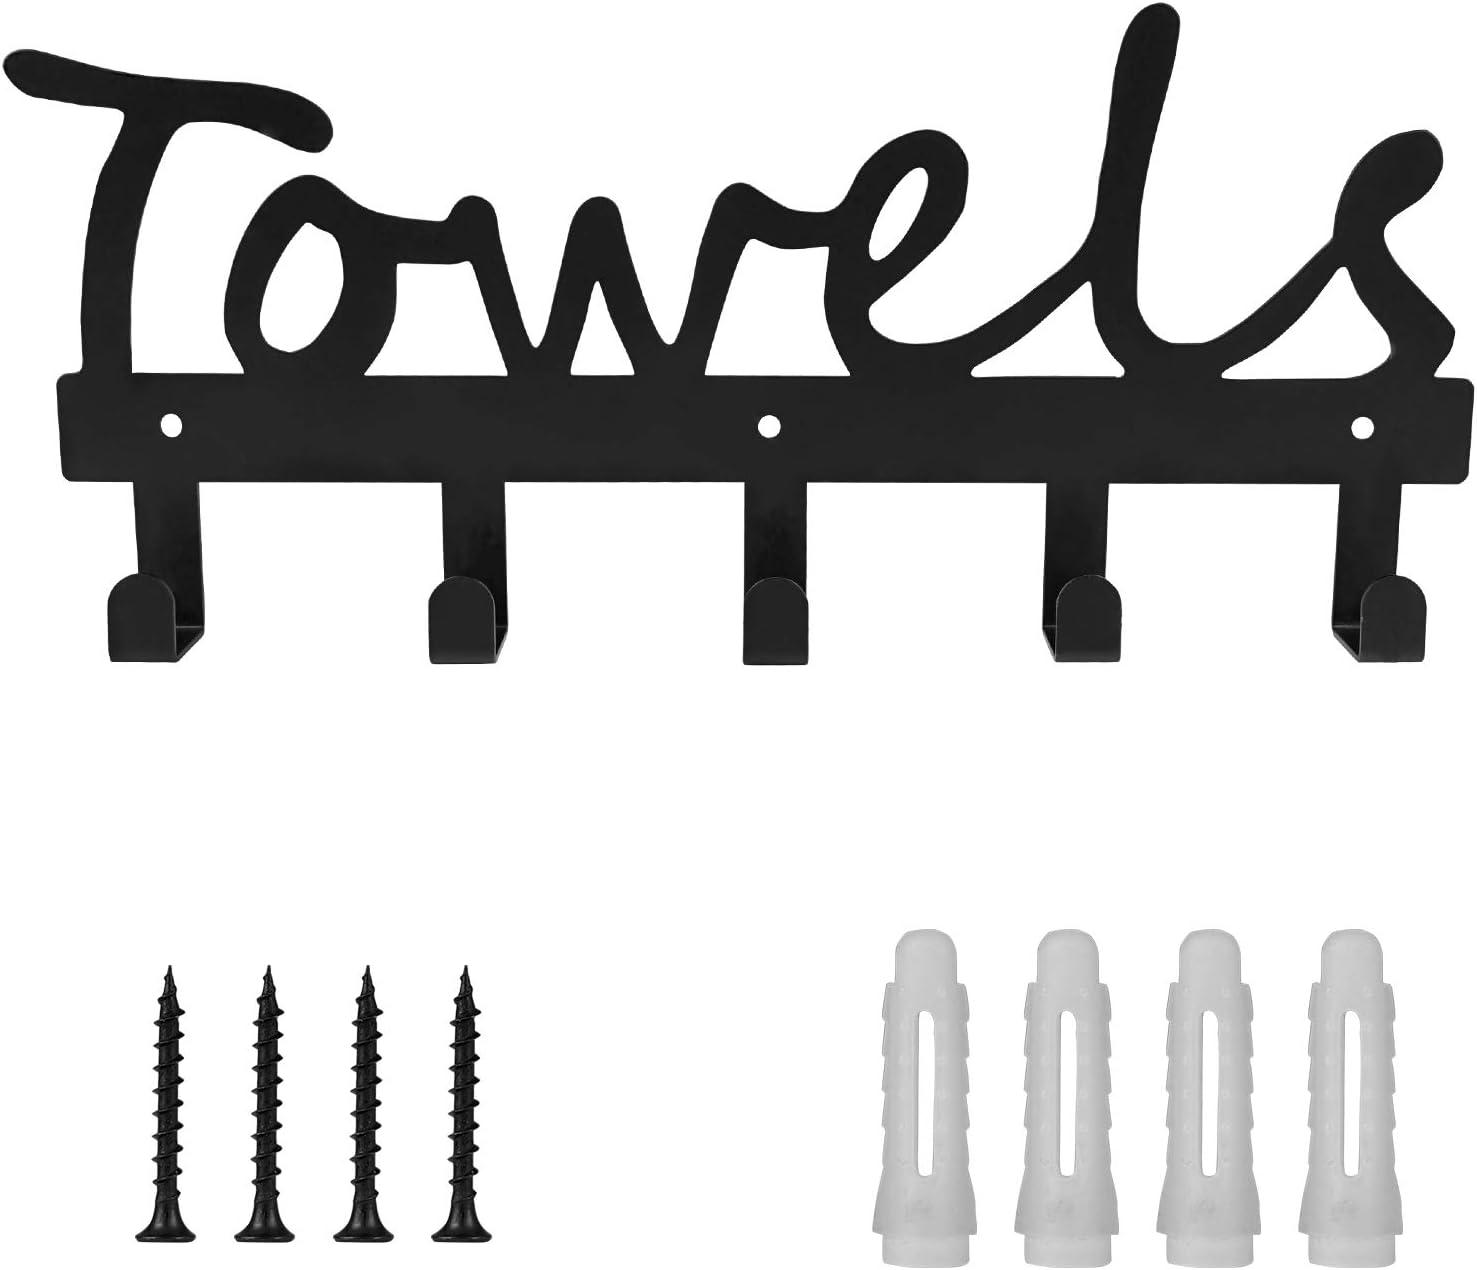 Towel Holder 5 Hooks for Bathroom, Towel Racks, Towel Hooks for Bathroom, Bedroom, Kitchen, Pool, Beach Towels, Bathrobe, Clothing, Metal Sandblasted Wall Mount Rustproof and Waterproof (Black02): Kitchen & Dining